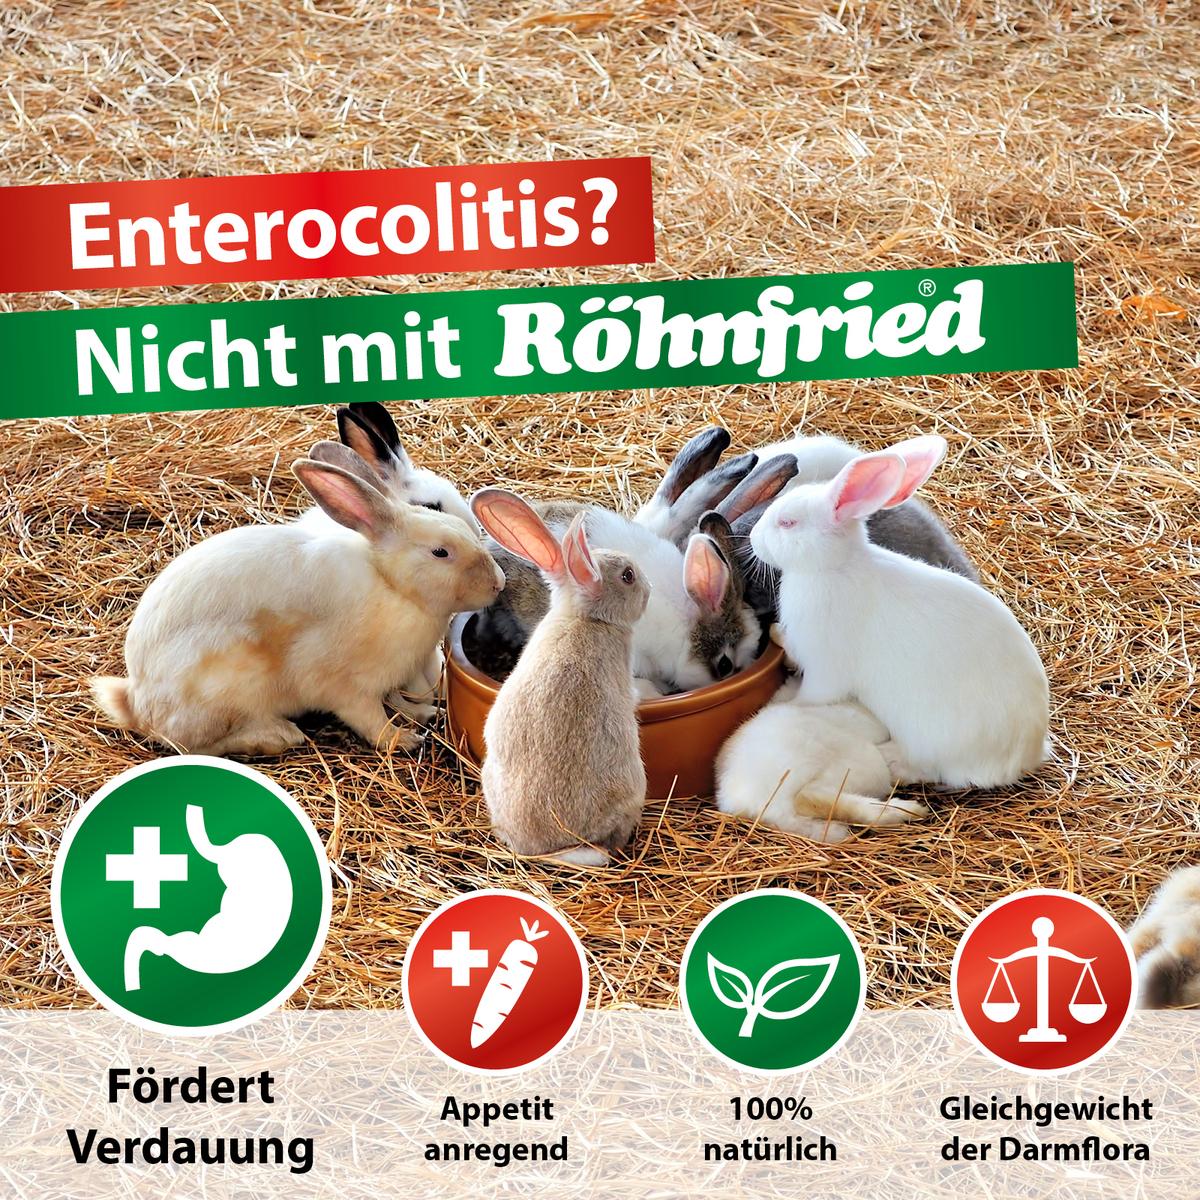 Kaninchen - Enterocolits - RHDV-2 - Vitaminmangel - Desinfektion Pro - Darmwohl - VitaKanin